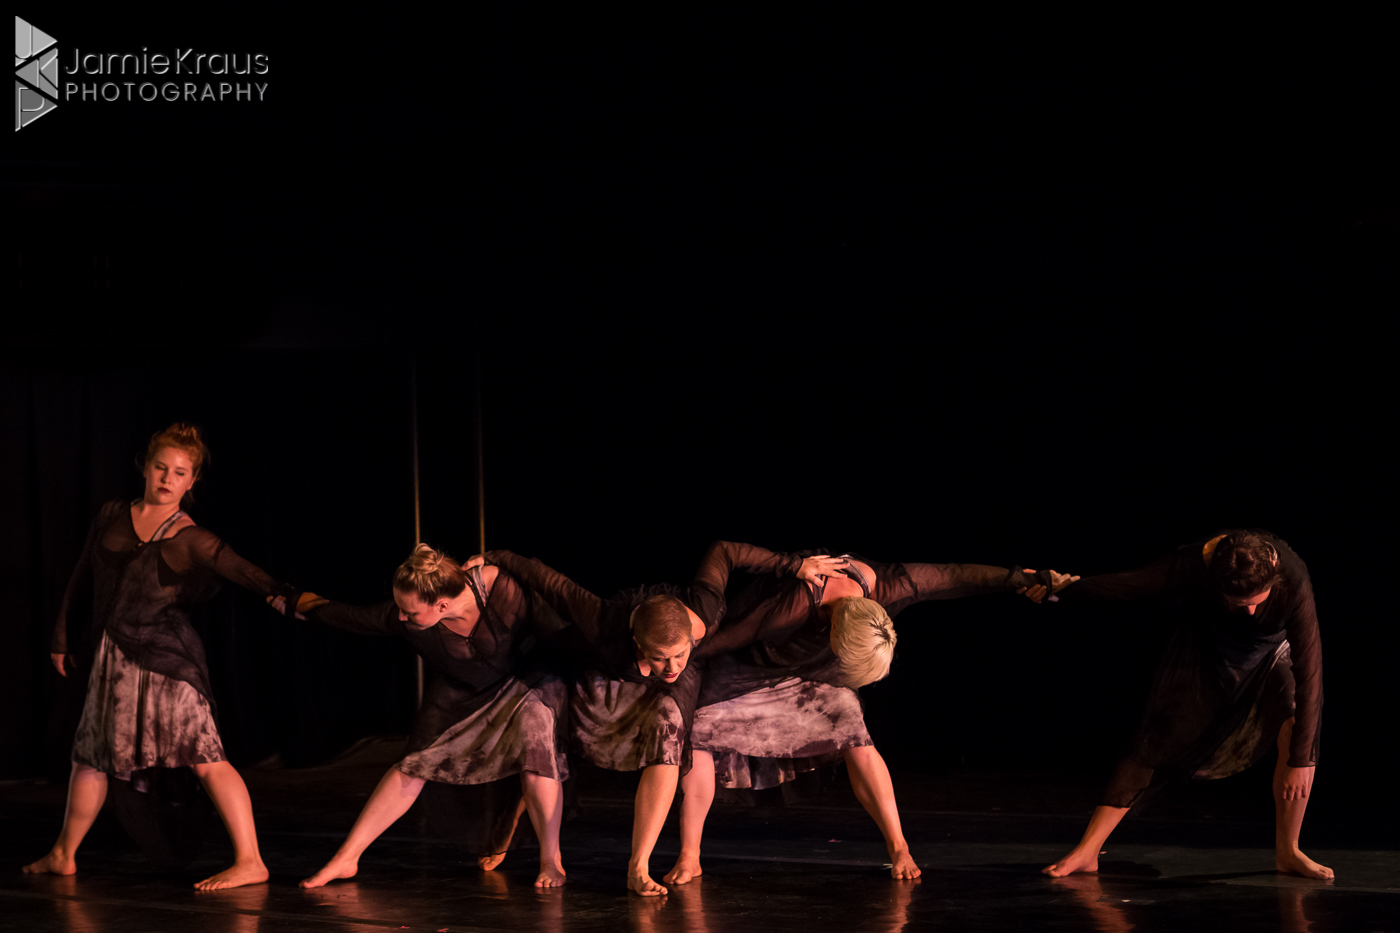 denver performing arts photo